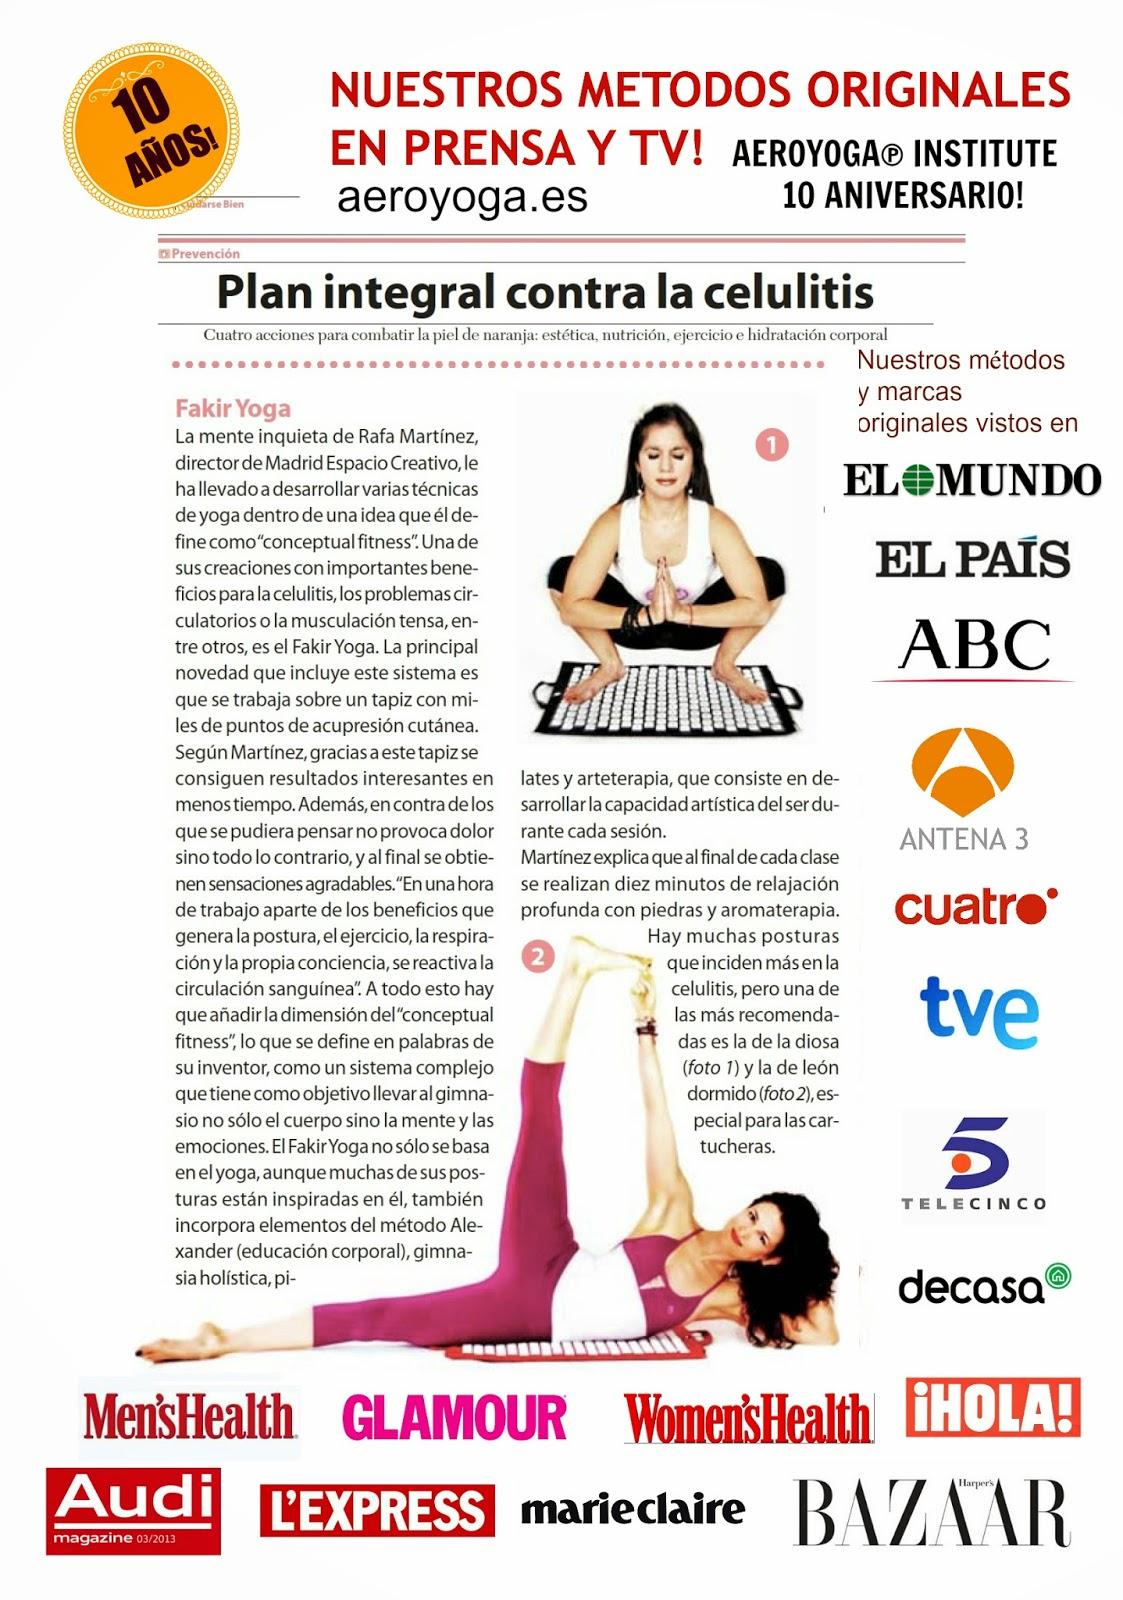 ayurveda yoga aereo anti age aerial pilates prensa tendencias belleza ejercicio